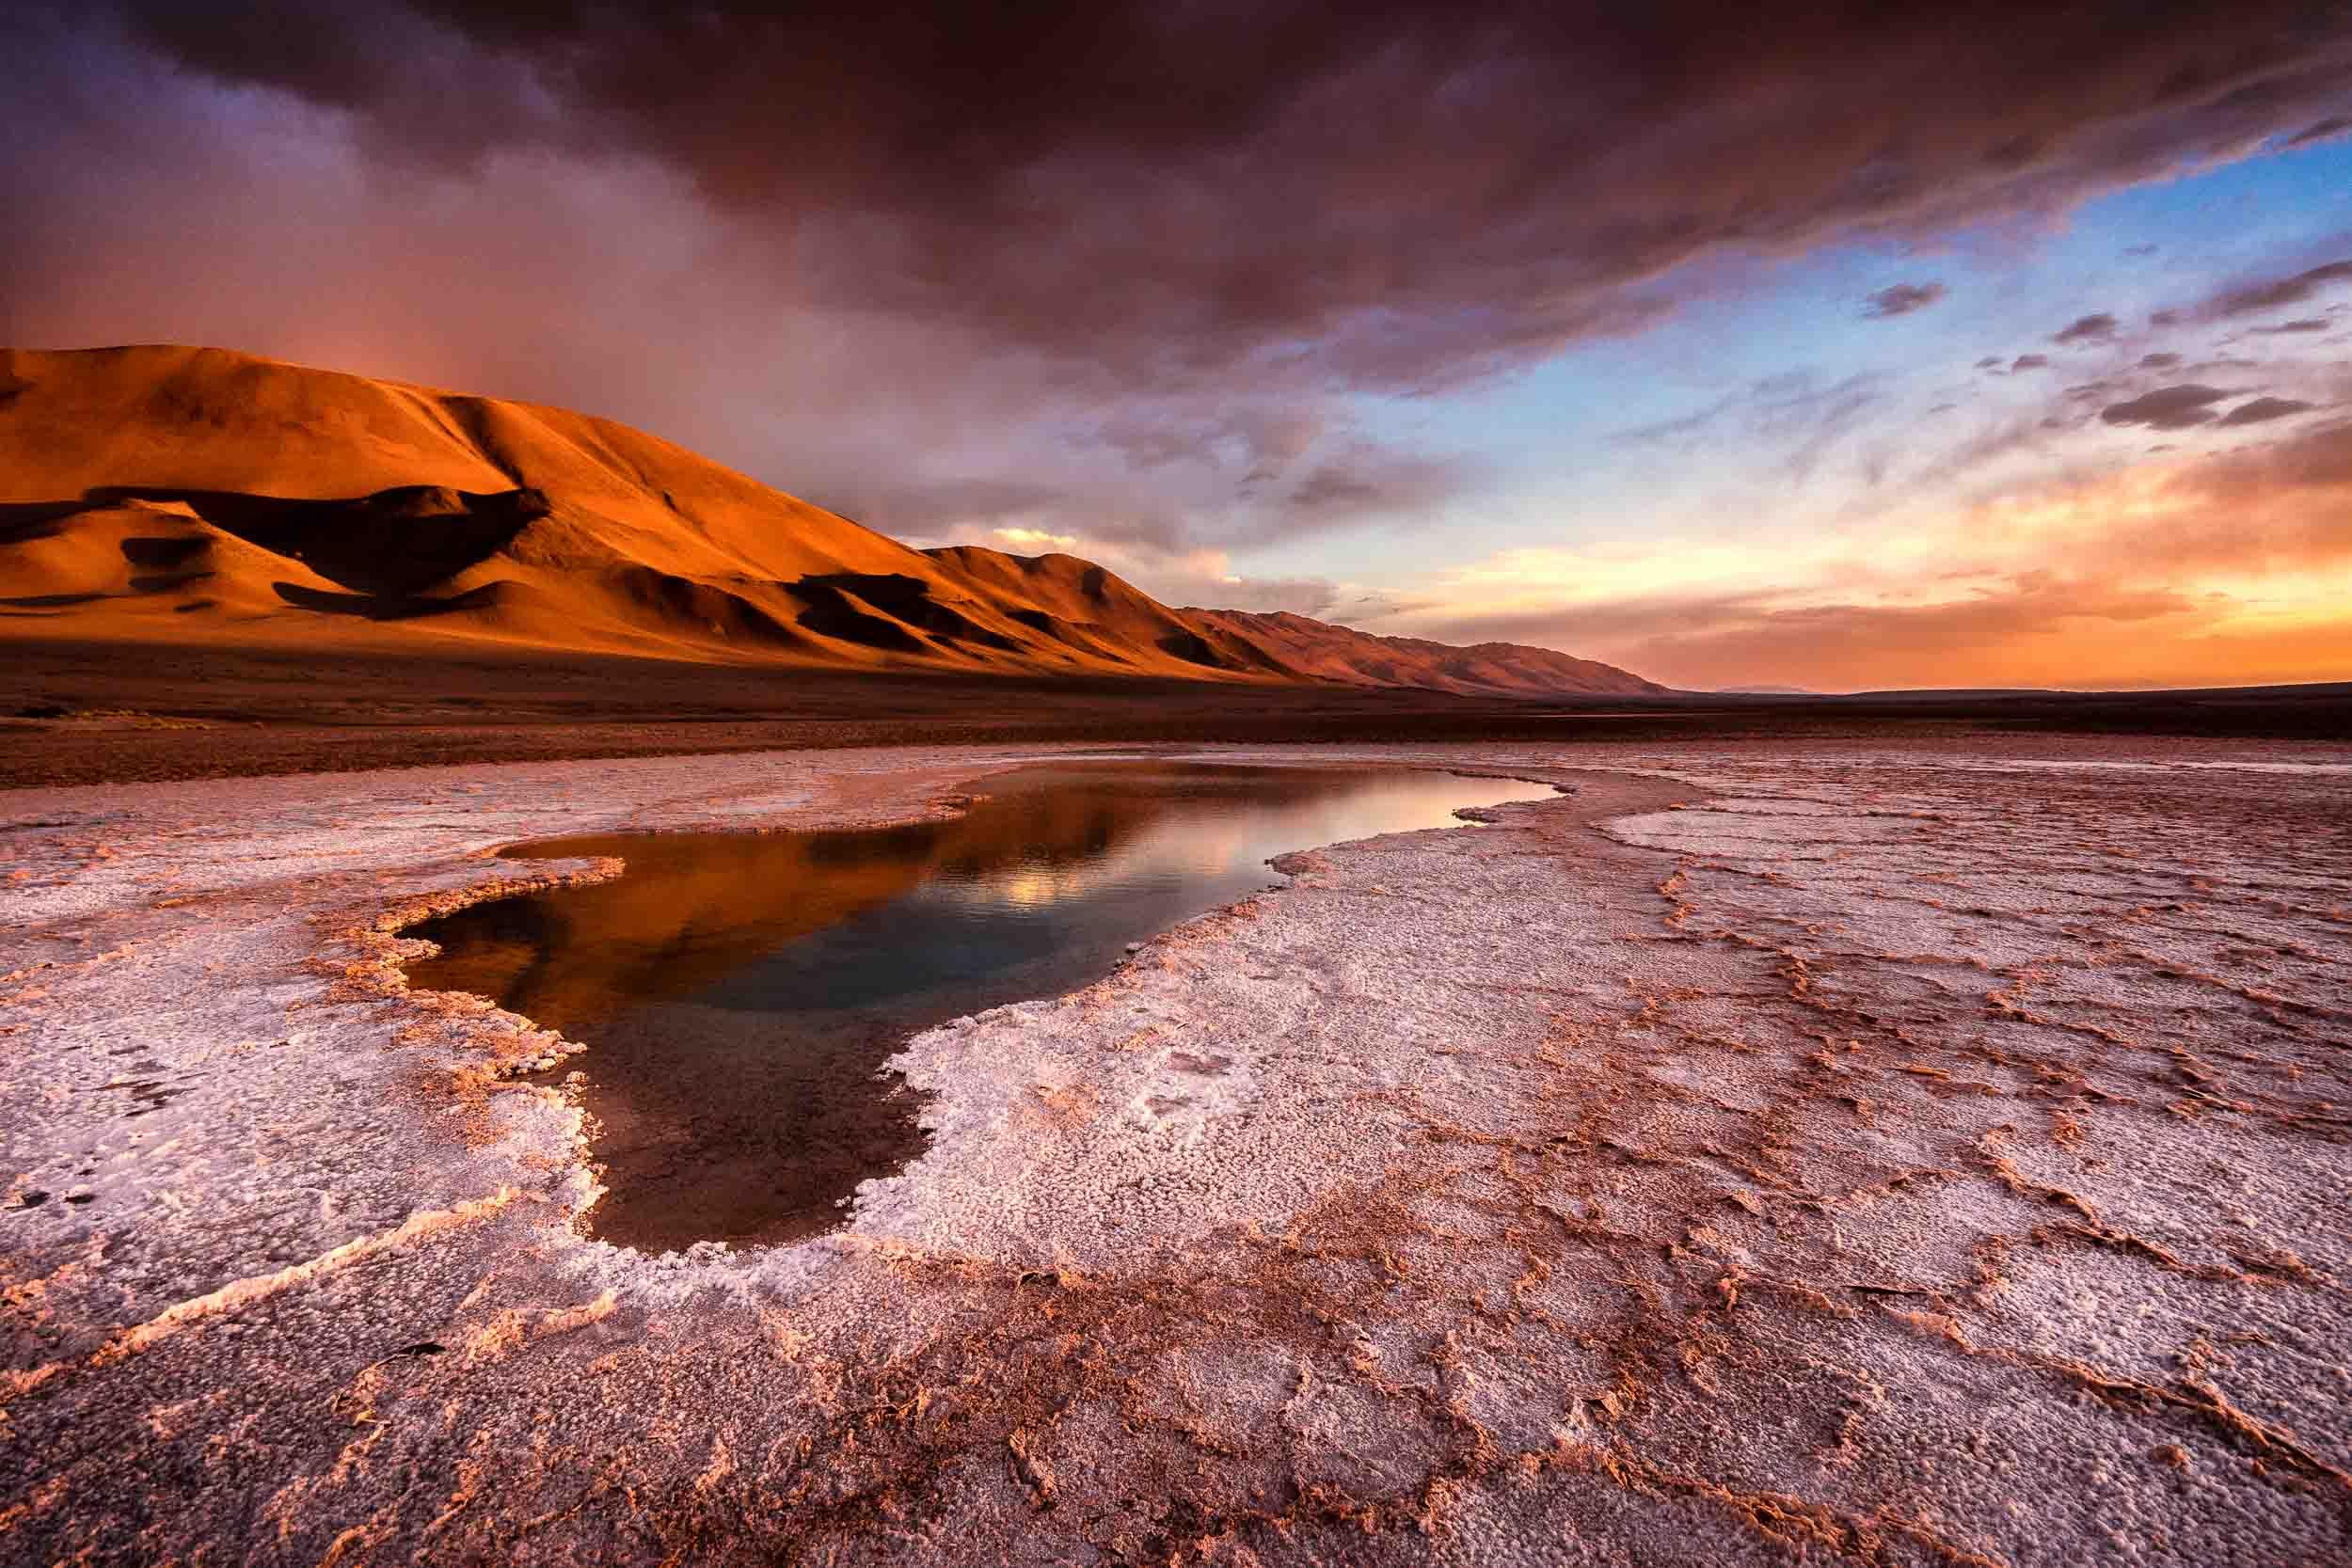 argentina-salta-dan-lembah-lerma-secret-world